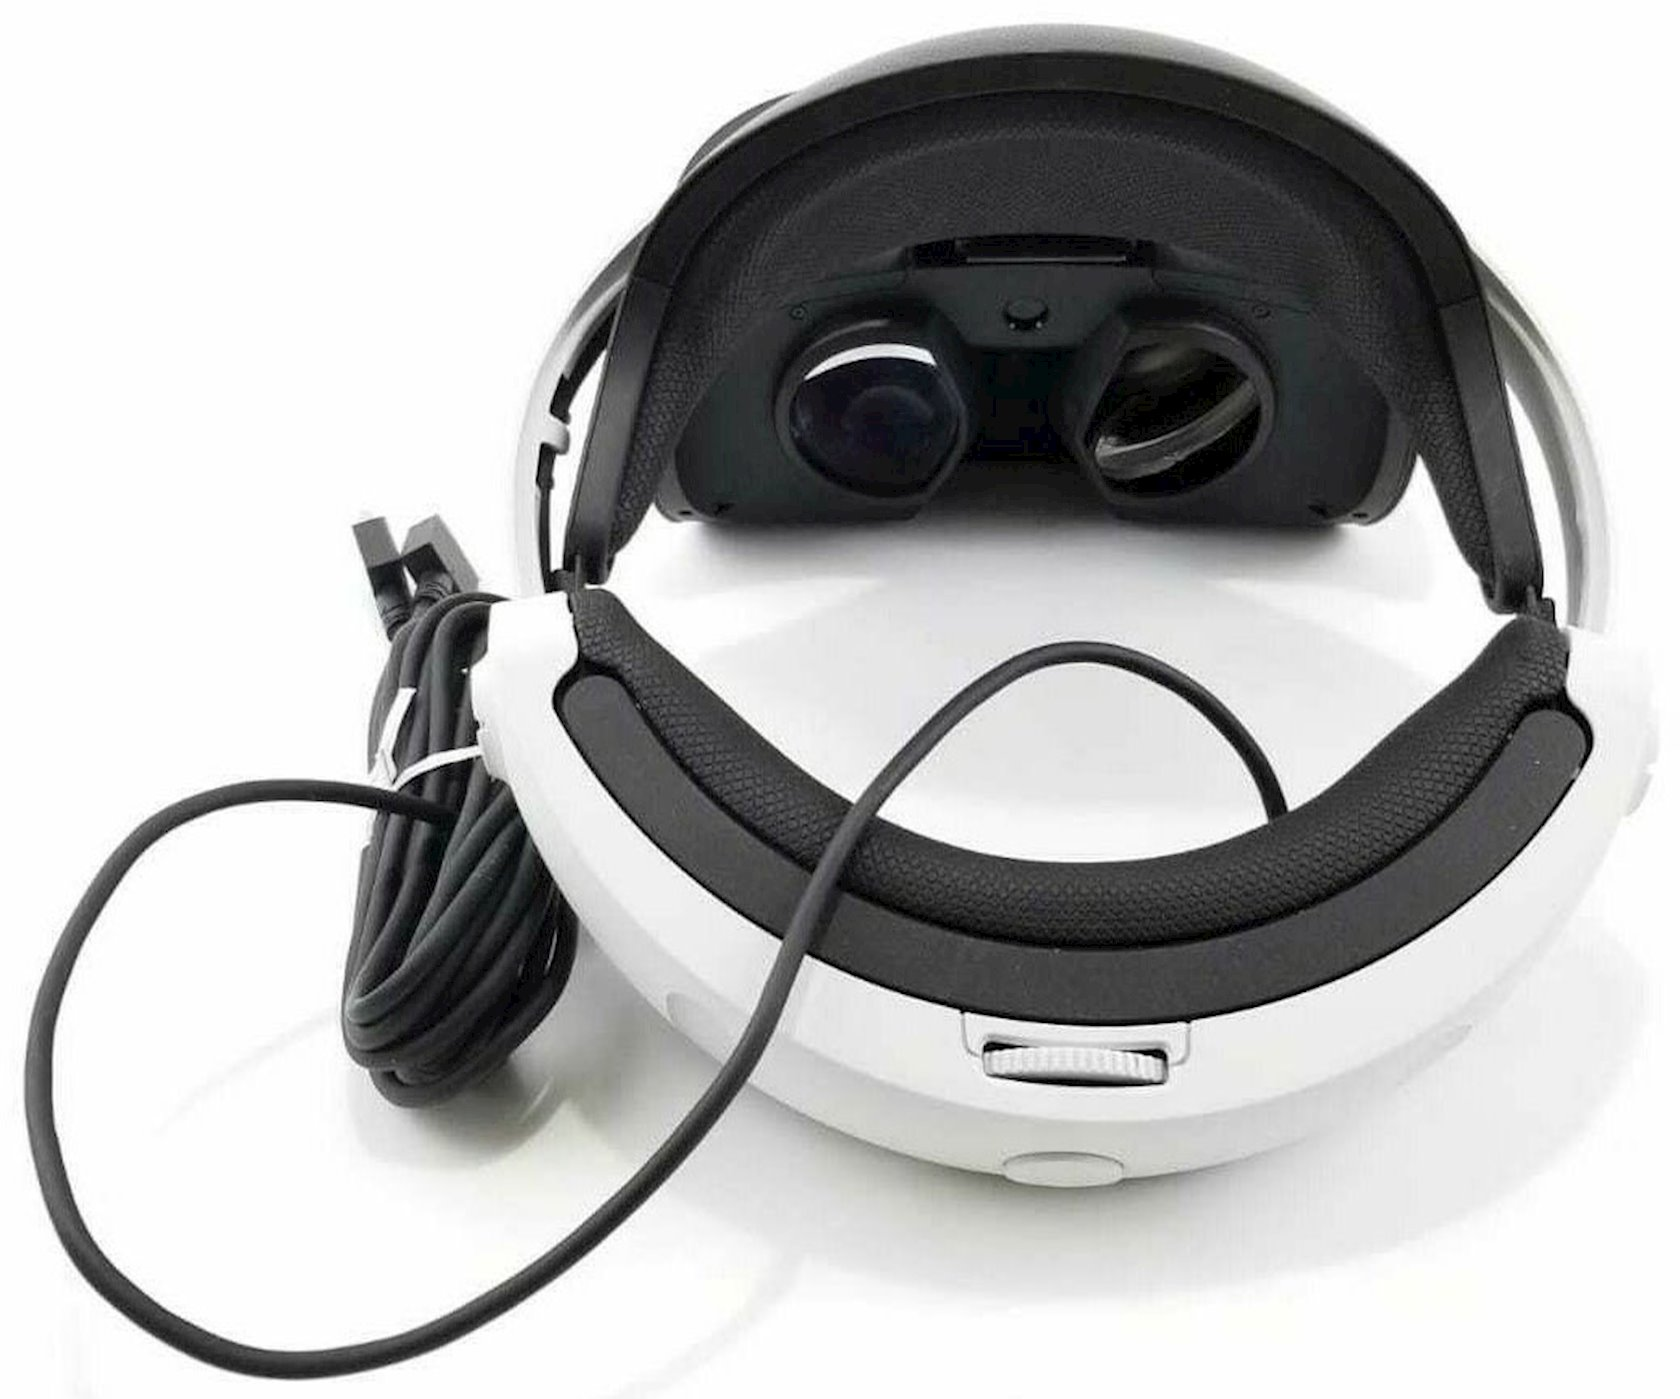 Oyun konsolu Sony Playstation VR Megapack + 5 Games + PS Camera